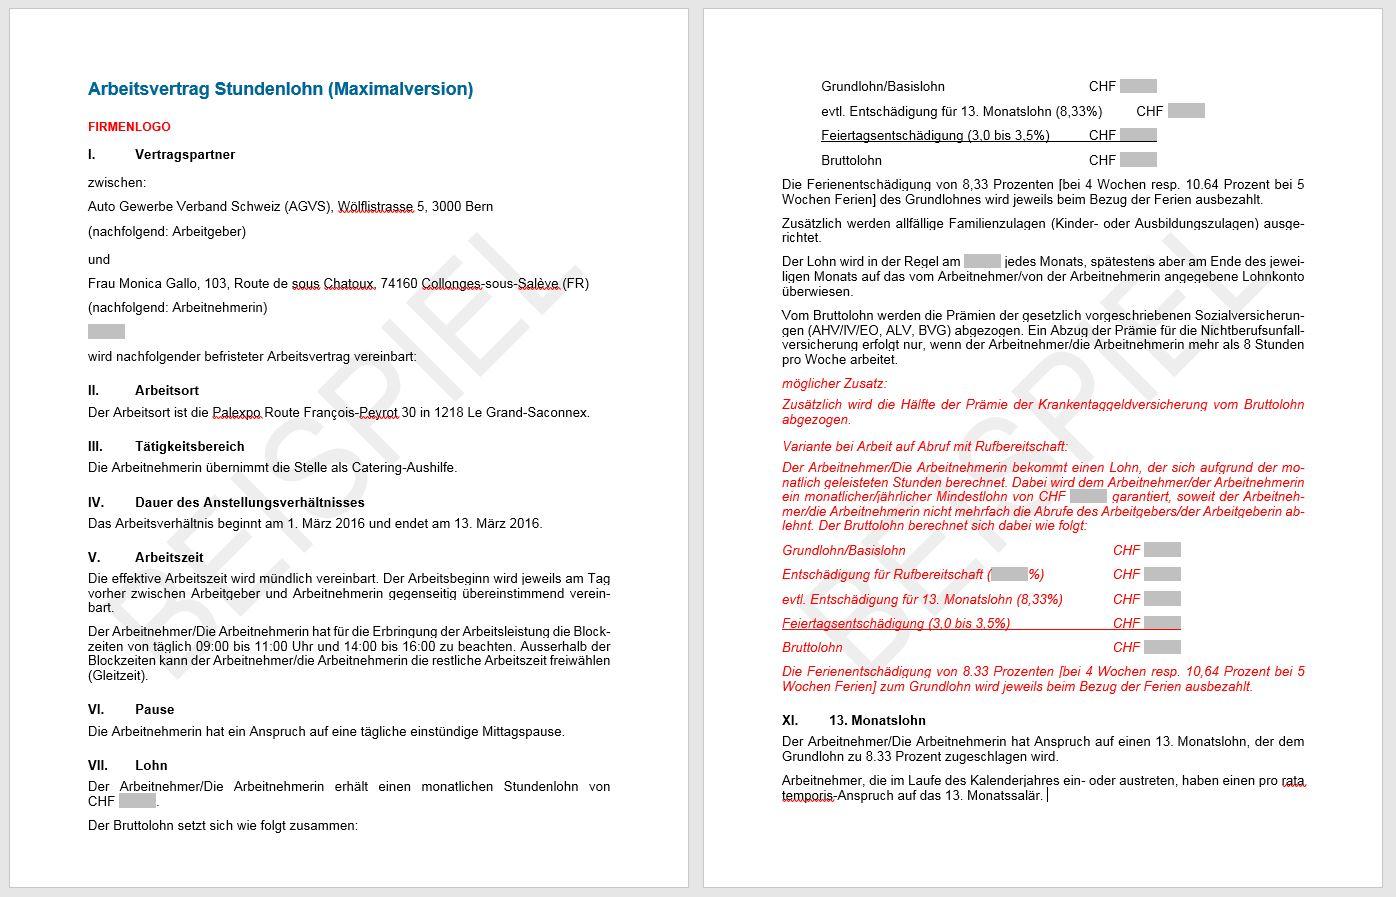 Download Arbeitsvertrag Stundenlohn Agvs Upsa Sektion